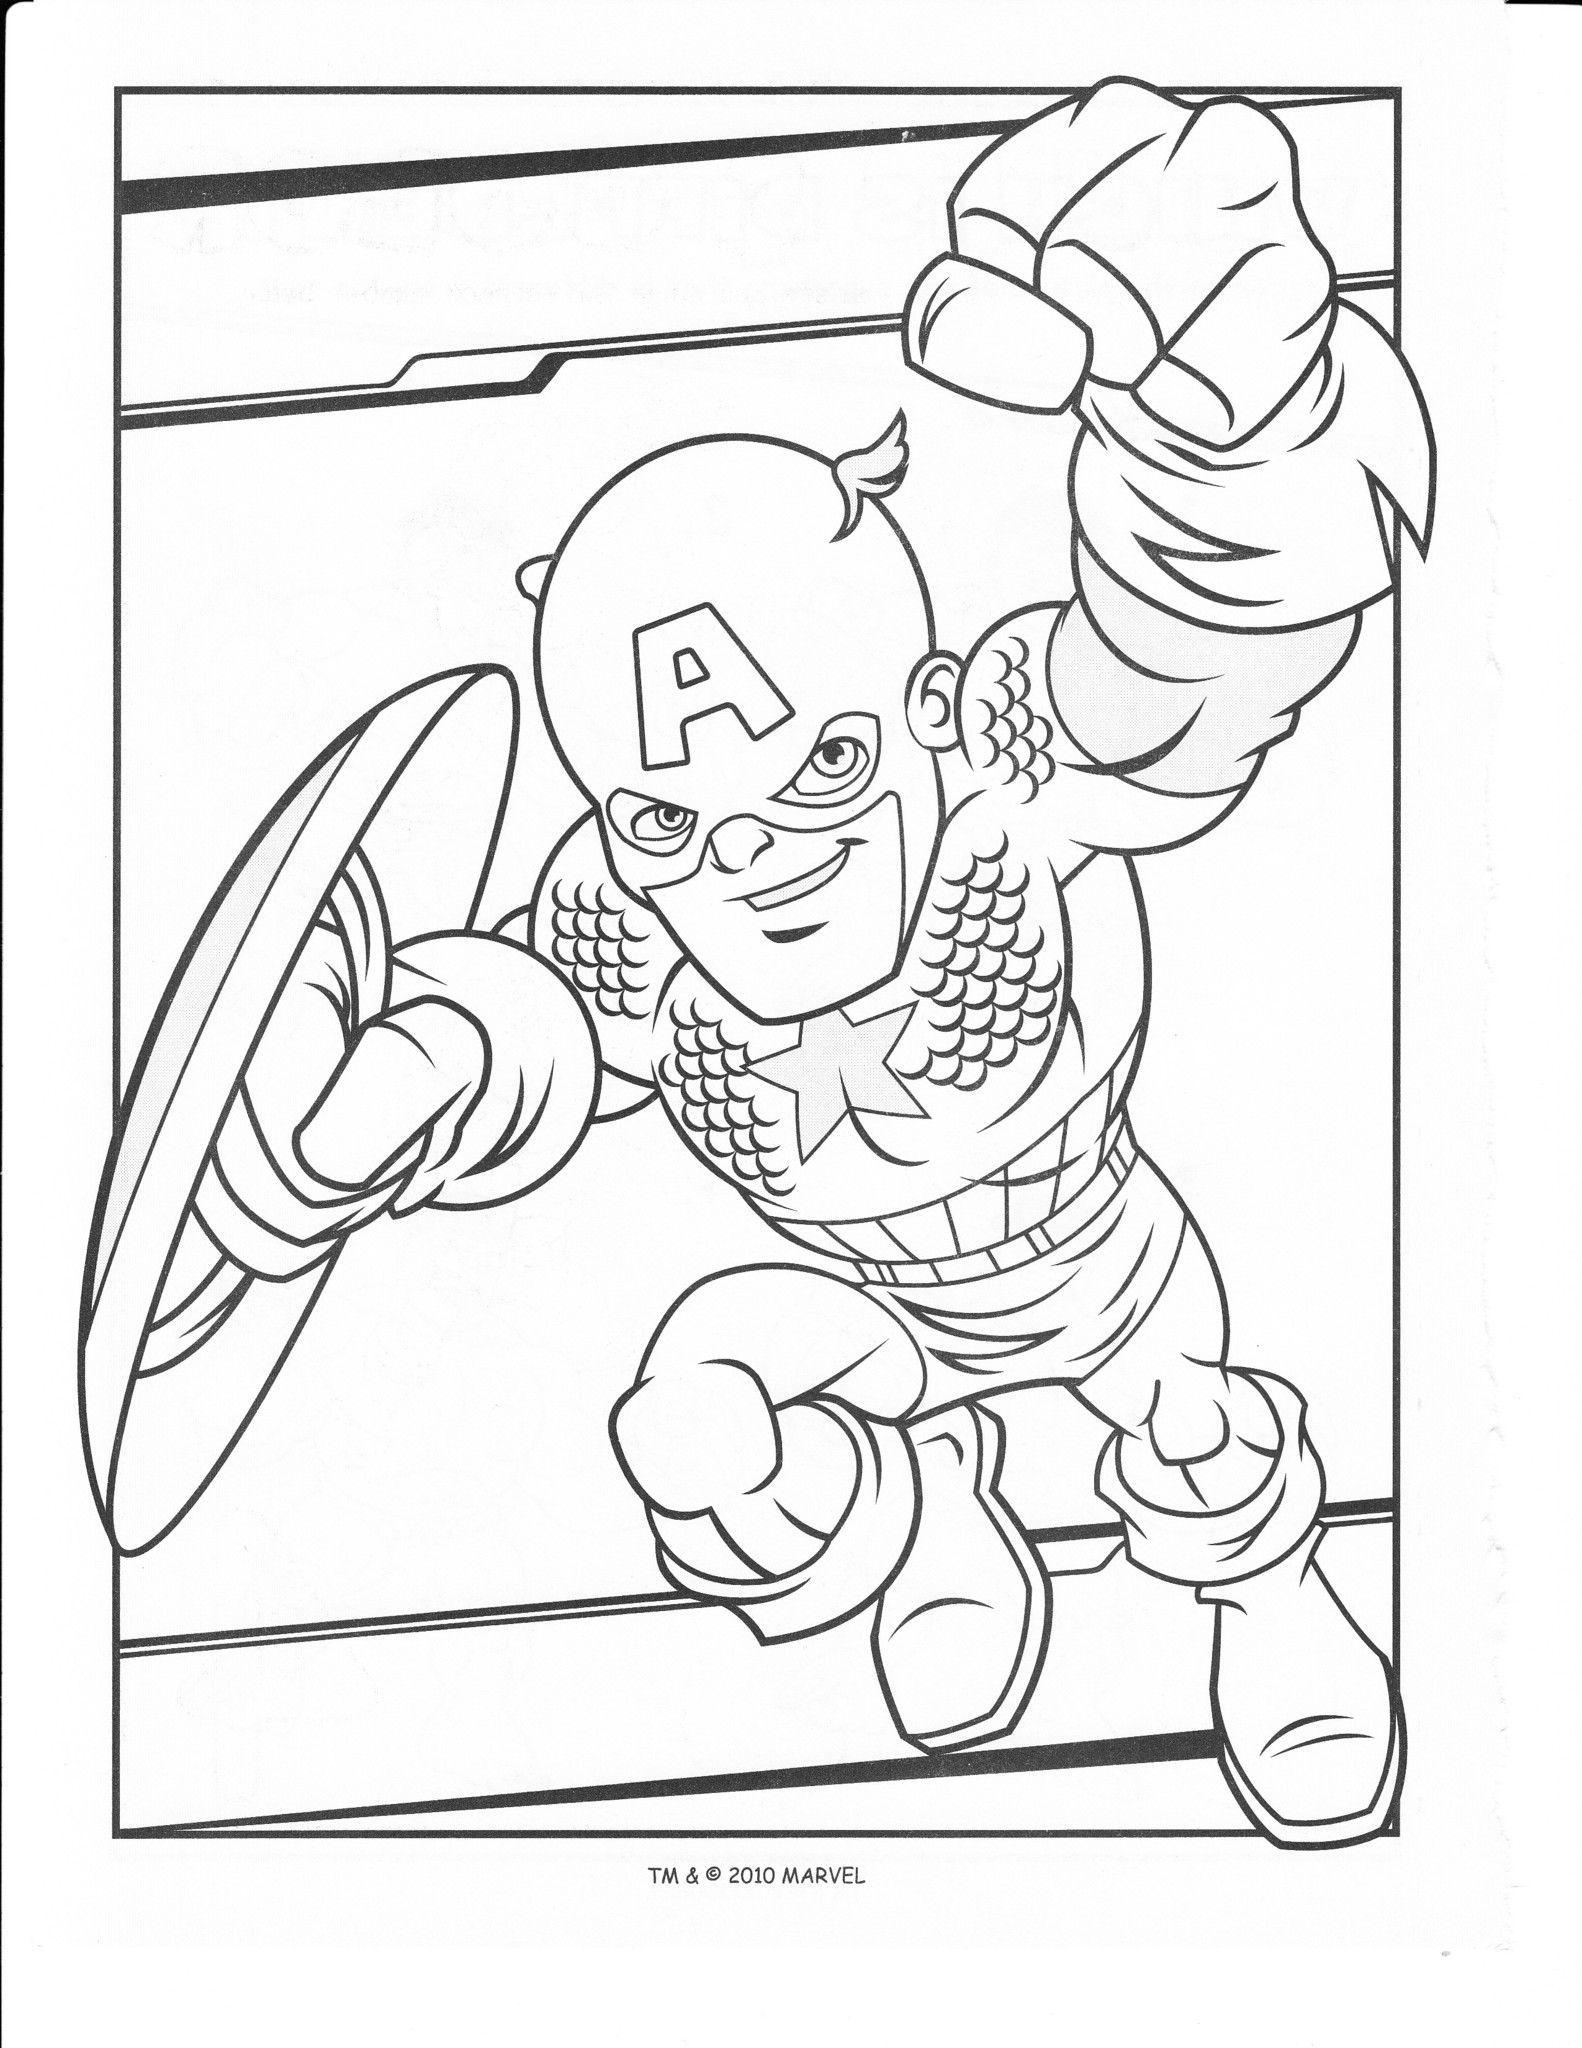 Coloriages Super Heros